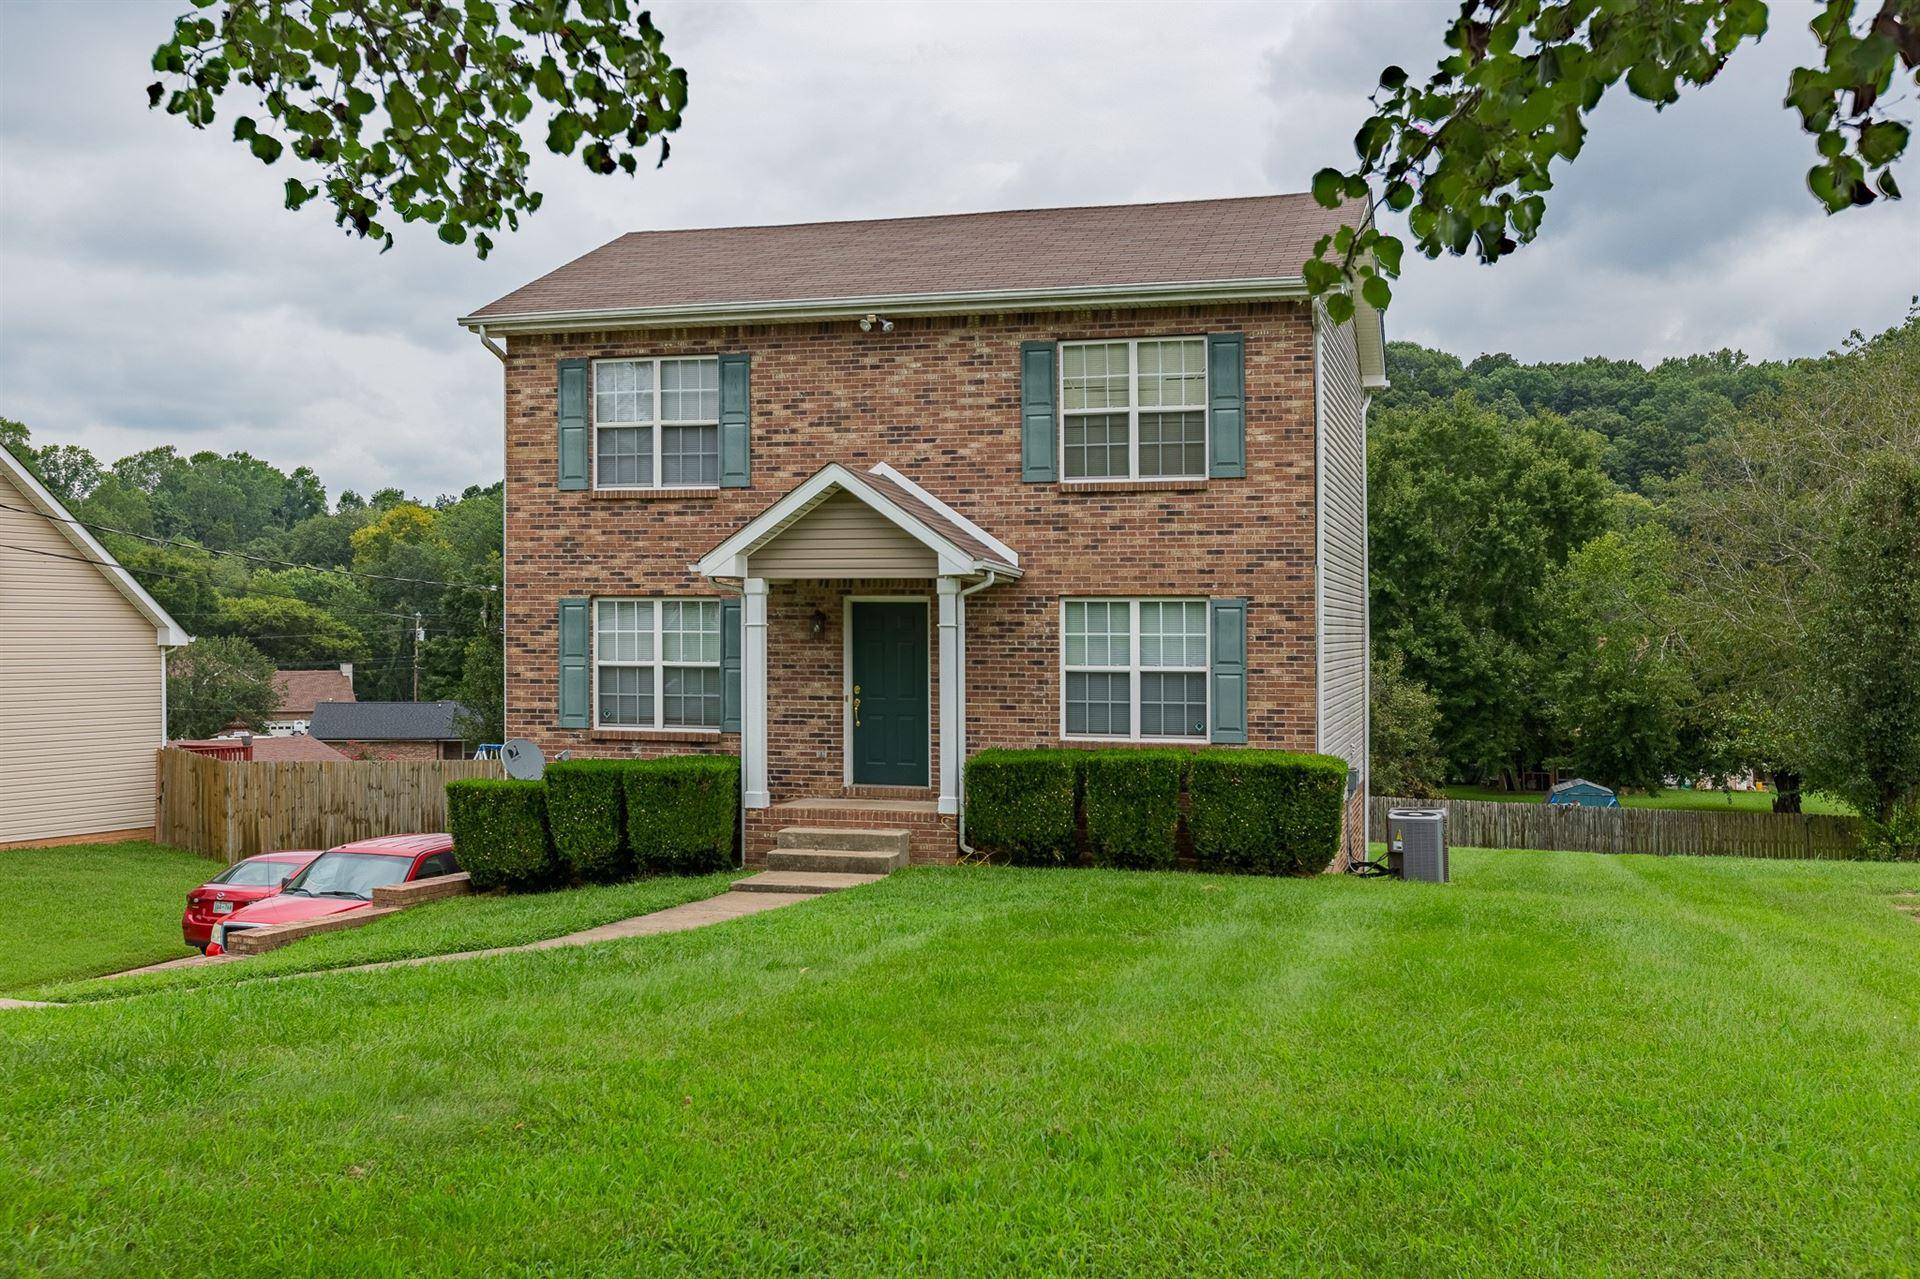 2683 Blue Willow Ct, Clarksville, TN 37042 - MLS#: 2289745